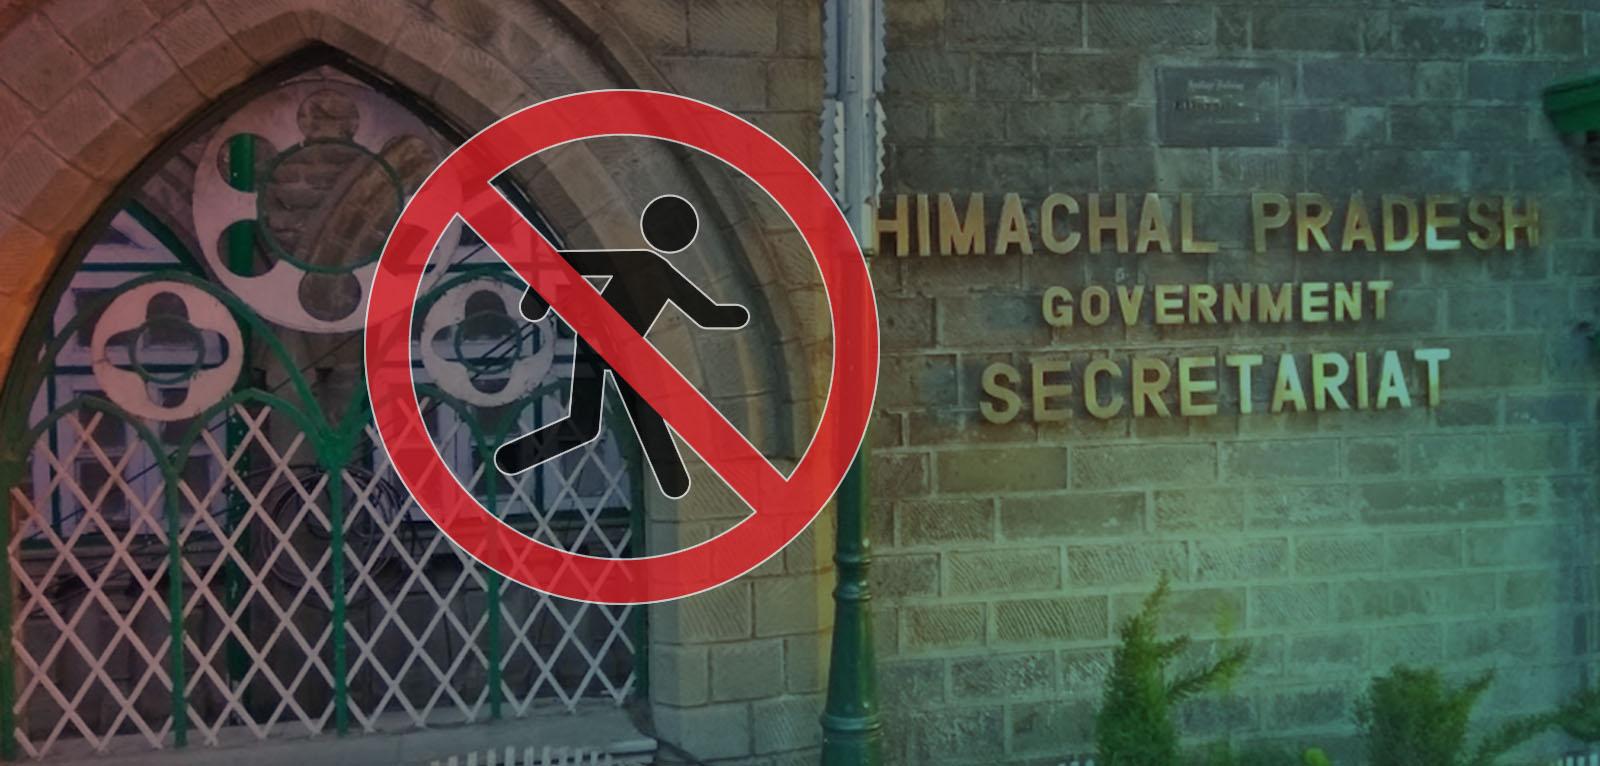 Himachal Pradesh entry to Hp Secretariat banned